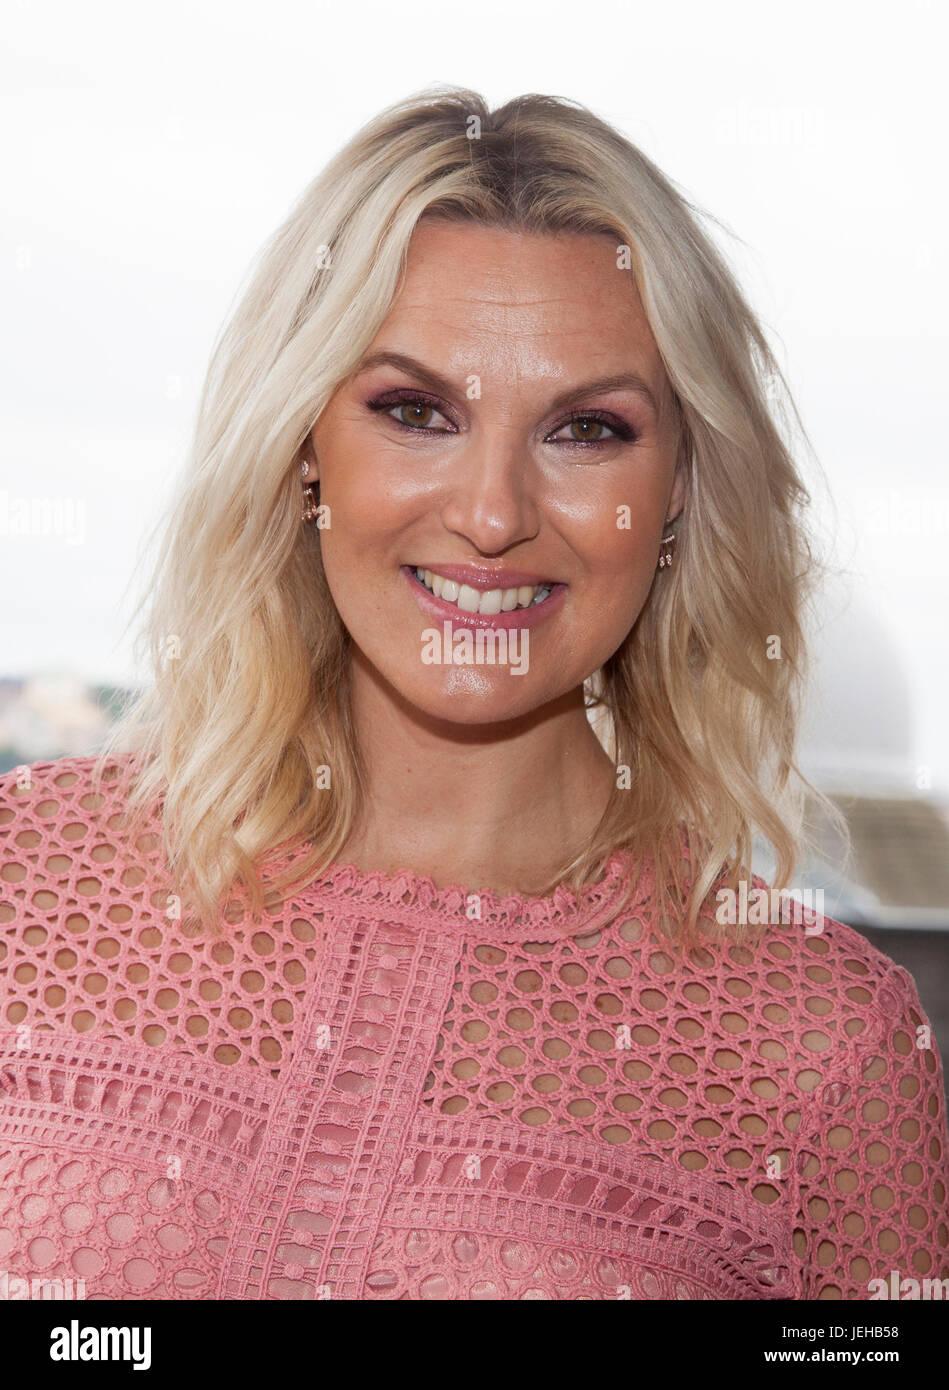 Sanna Nielsen Swedish Singer And Television Host For Allsang Pa Skansen In Swedish Television